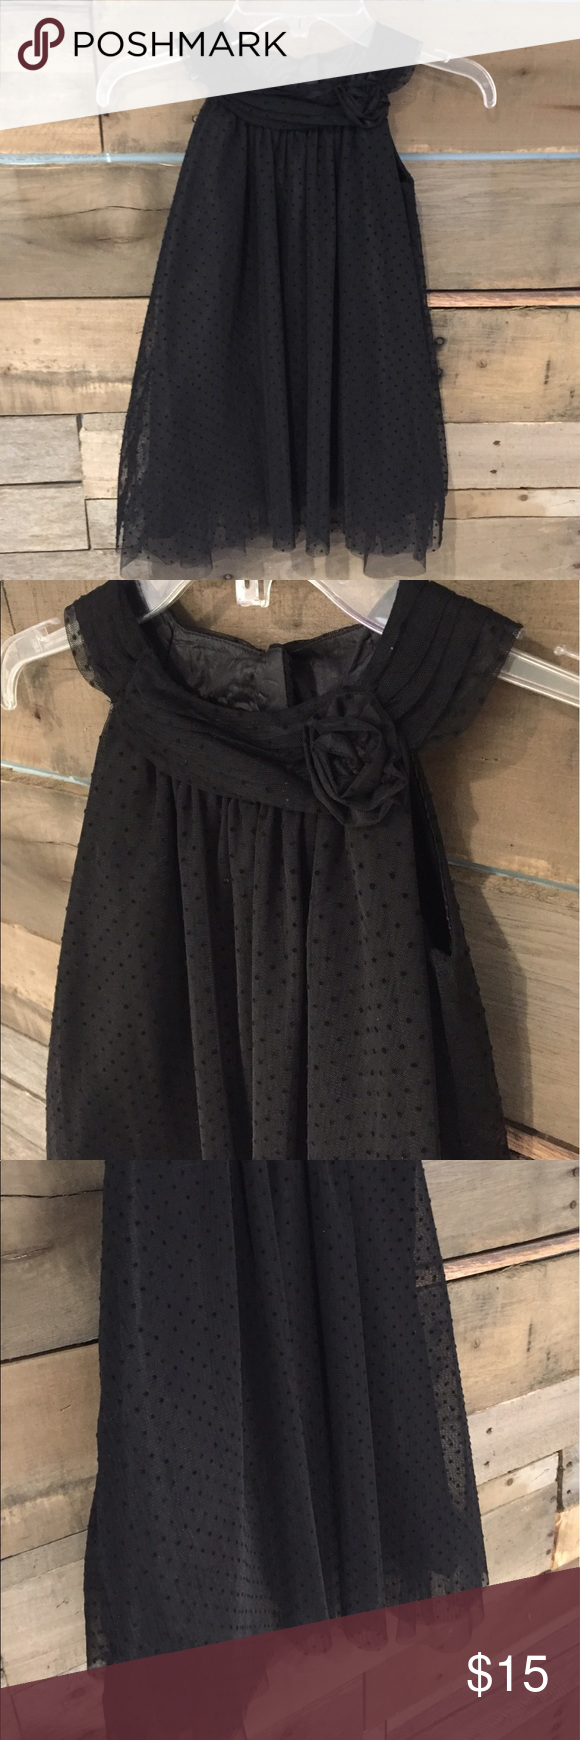 Osh Kosh Black Dress Size 3t Dresses Clothes Design Fashion Design [ 1740 x 580 Pixel ]